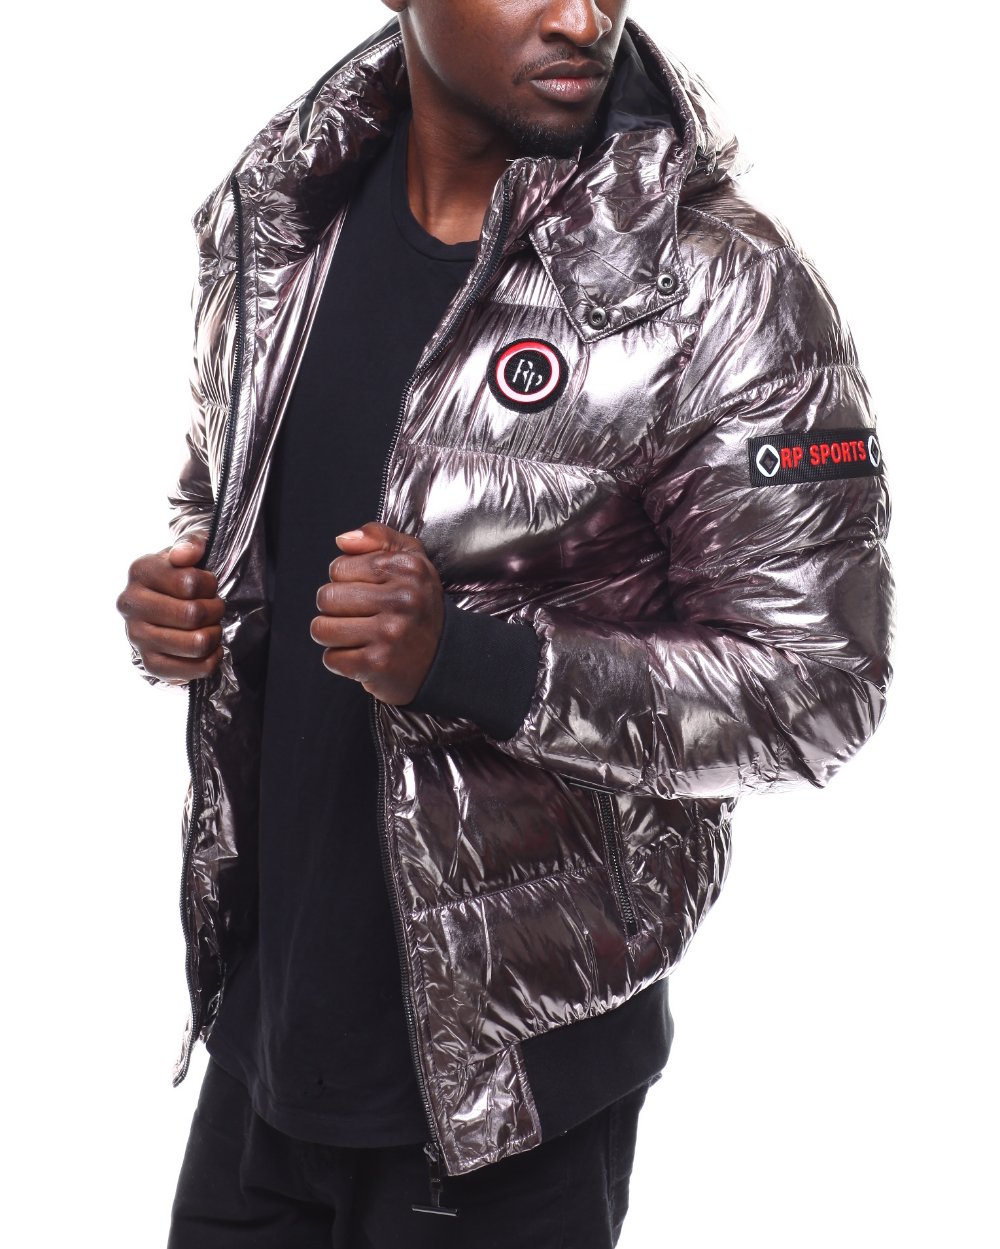 Buy Metallic Puffer Jacket By Robert Phillipe Men S Outerwear From Buyers Picks Find Buyers Picks Fashion More At Drjays Jackets Sweater Hoodie Kids Jacket [ 1249 x 1000 Pixel ]